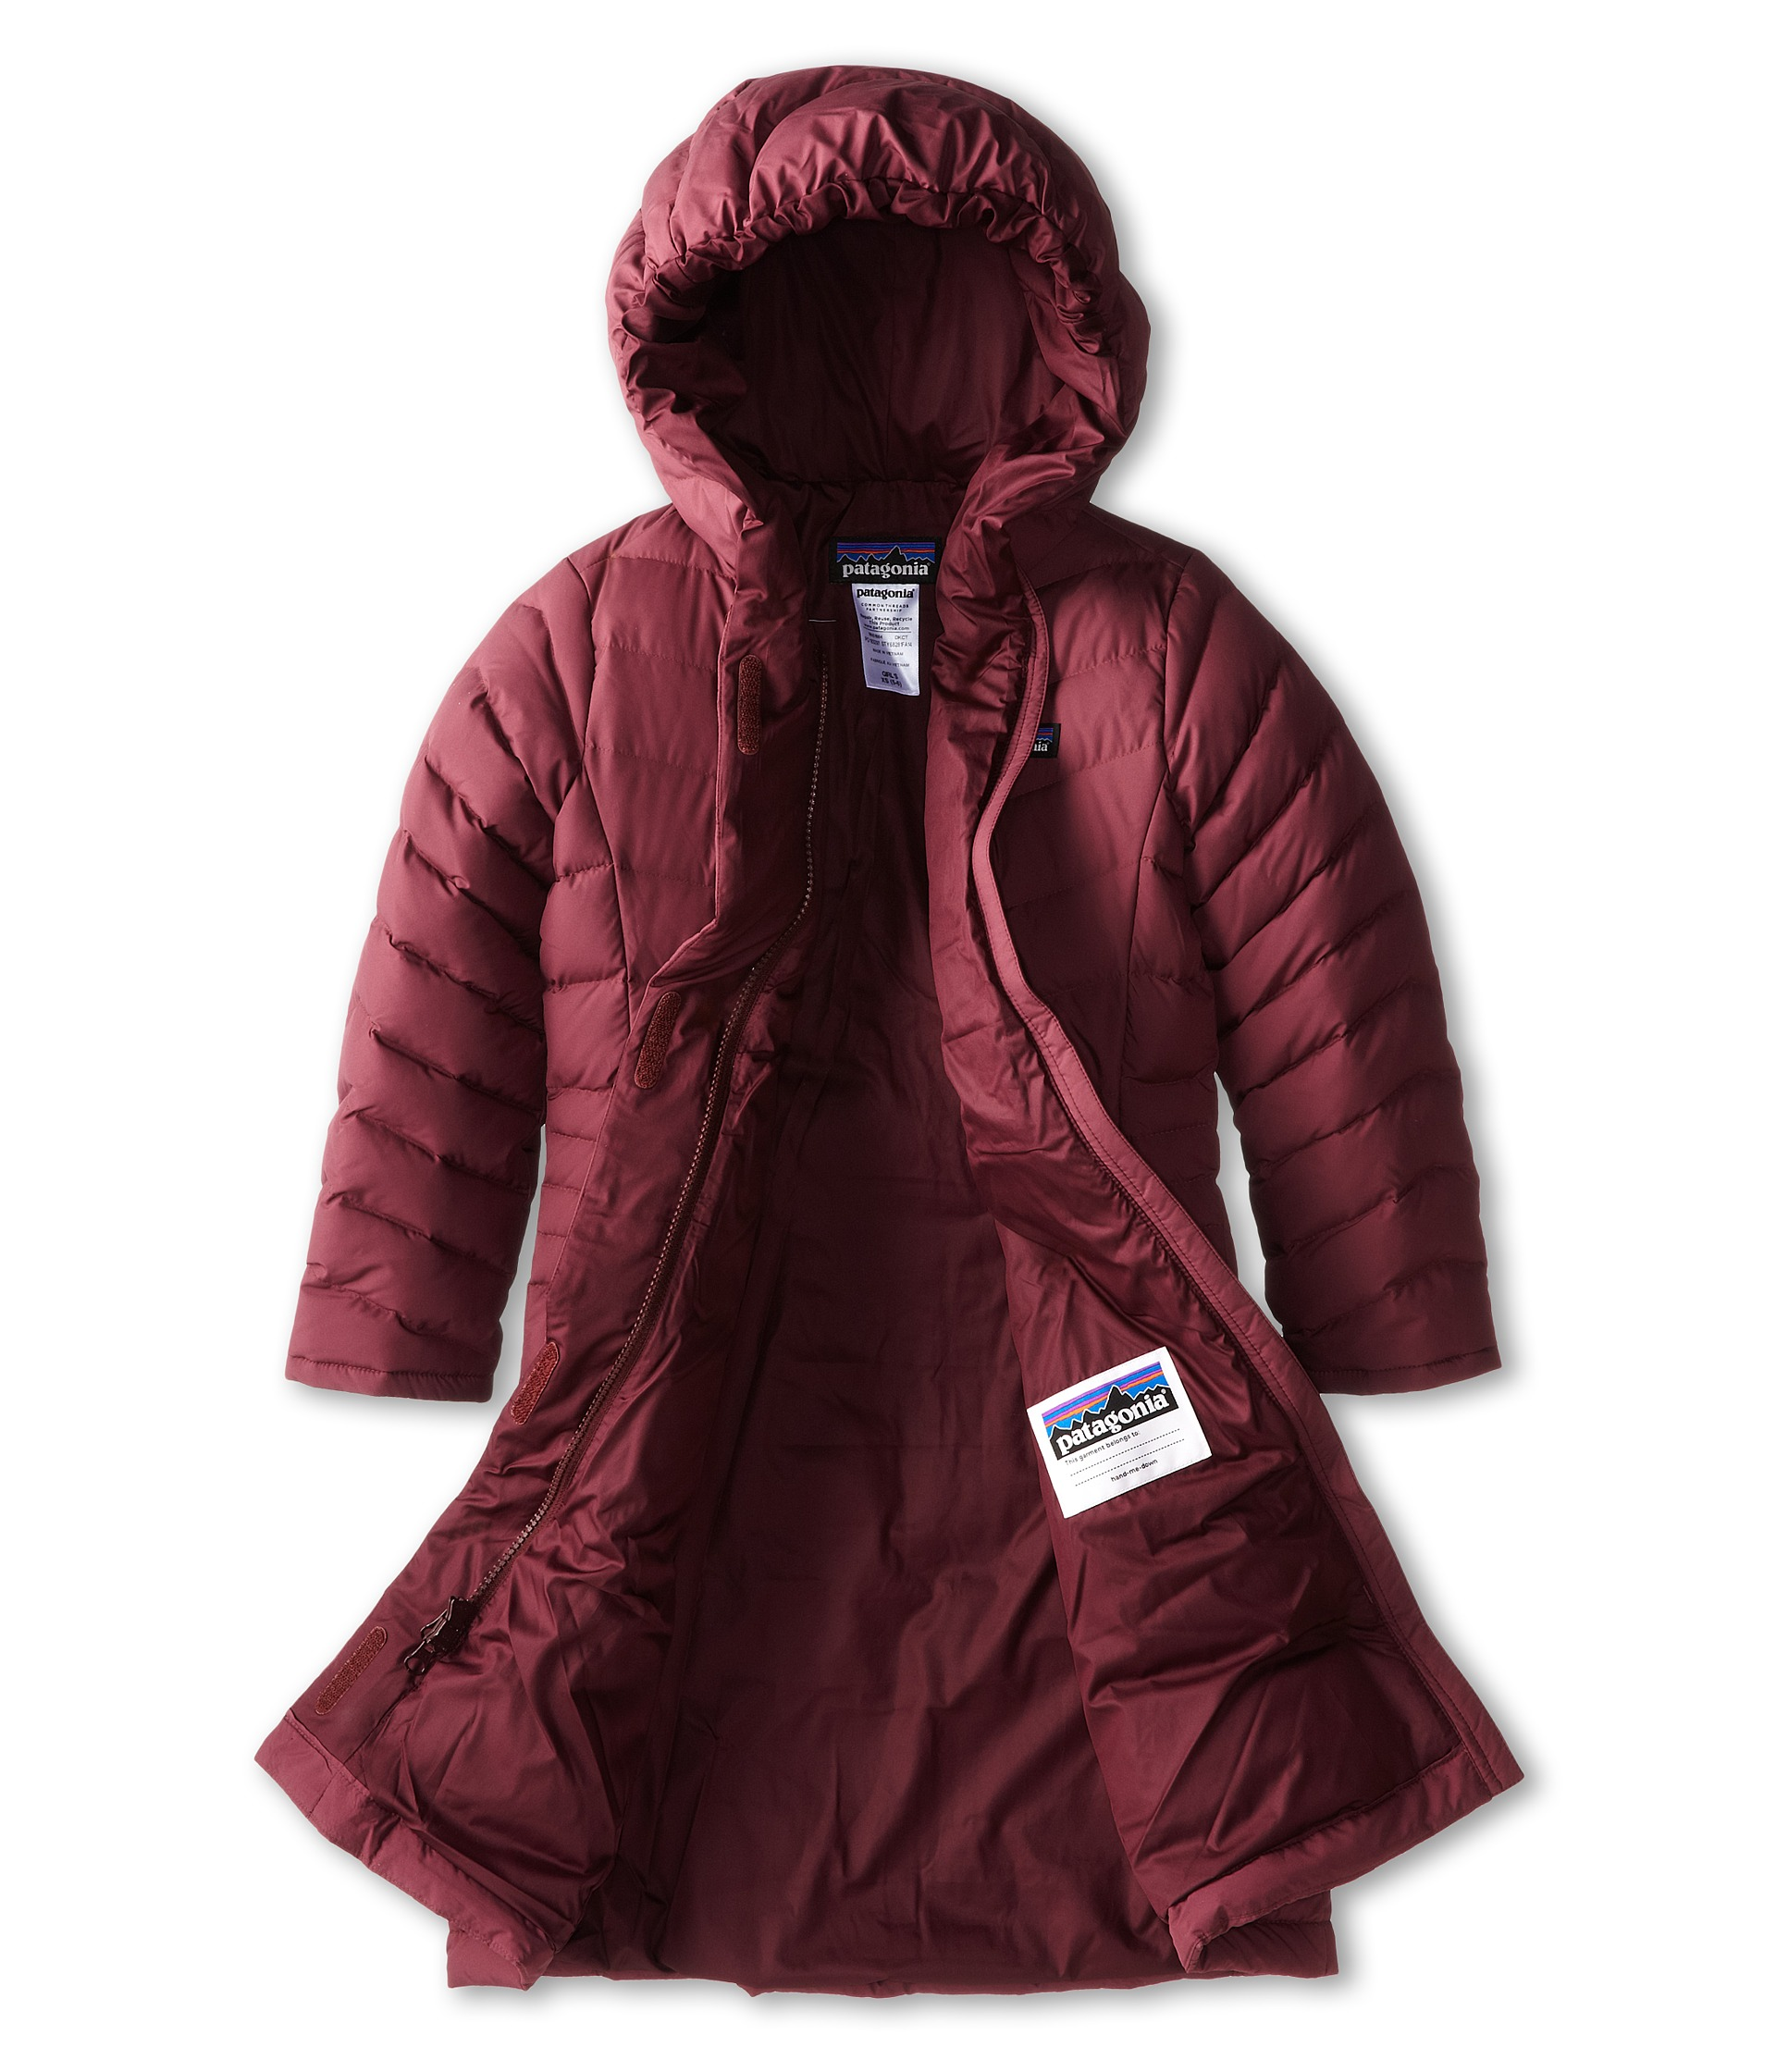 Patagonia Kids Coats: Patagonia Kids Girls Down Coat Little Kids Big Kids Dark